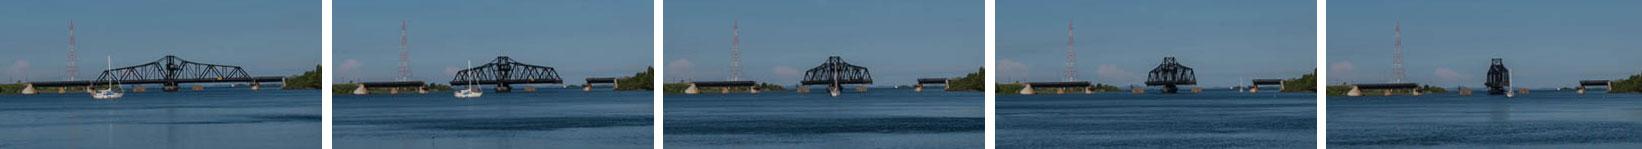 Swing bridge opening